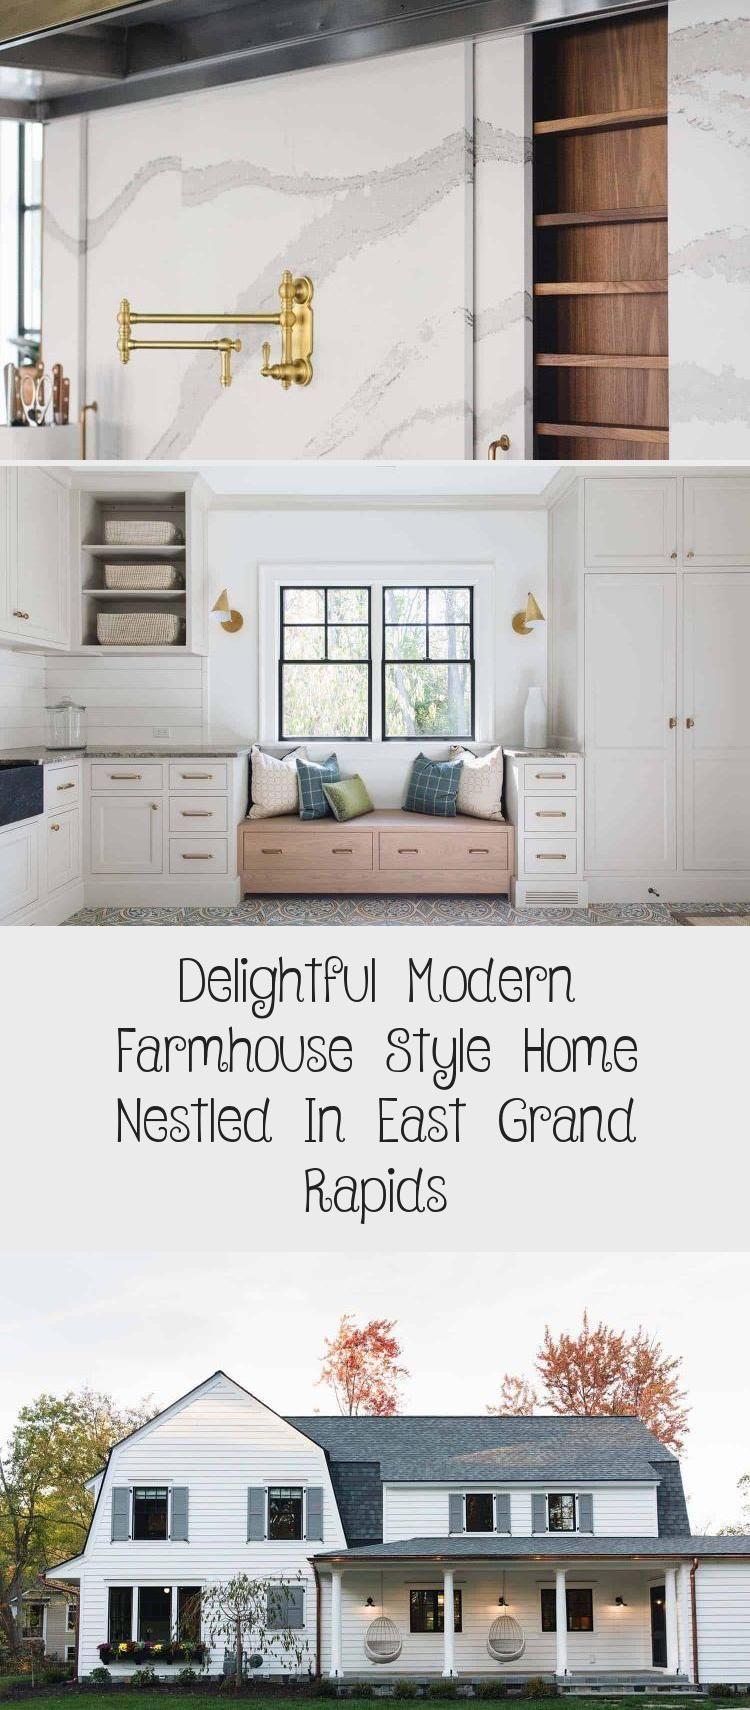 Delightful Modern Farmhouse Style Home Nestled In East Grand Rapids Erin S Blog In 2020 Farmhouse Style House Modern Farmhouse Style Modern Farmhouse